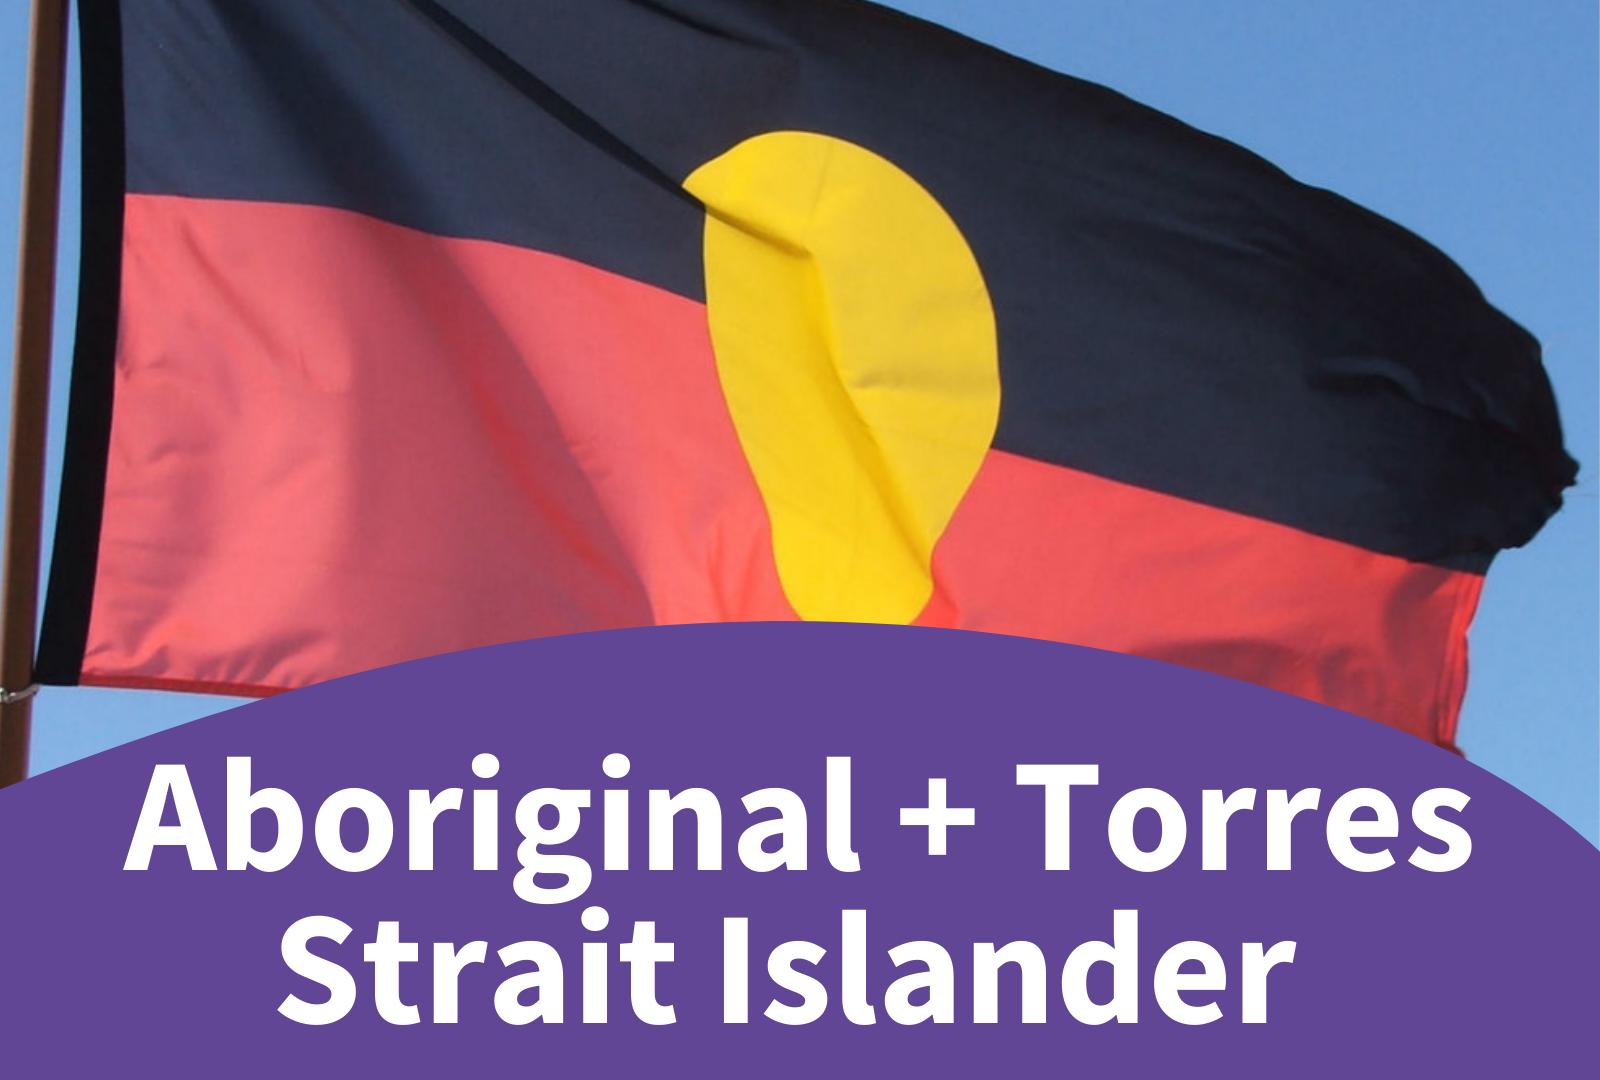 Photo of the Aboriginal flag